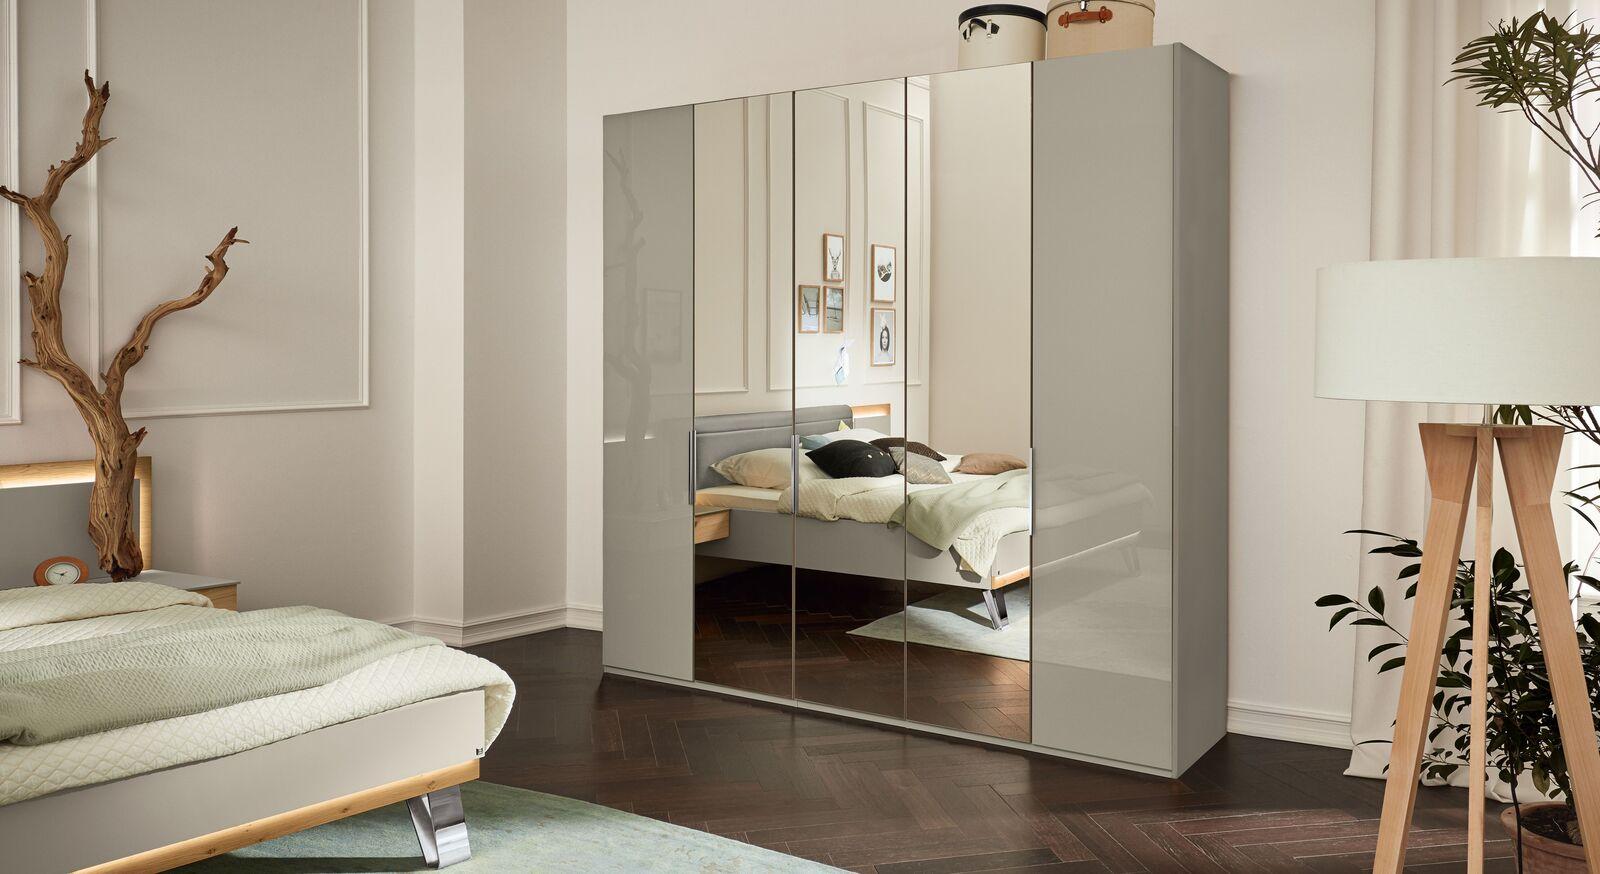 MUSTERRING Spiegel-Kleiderschrank Saphira kieselgrau in modernem Look